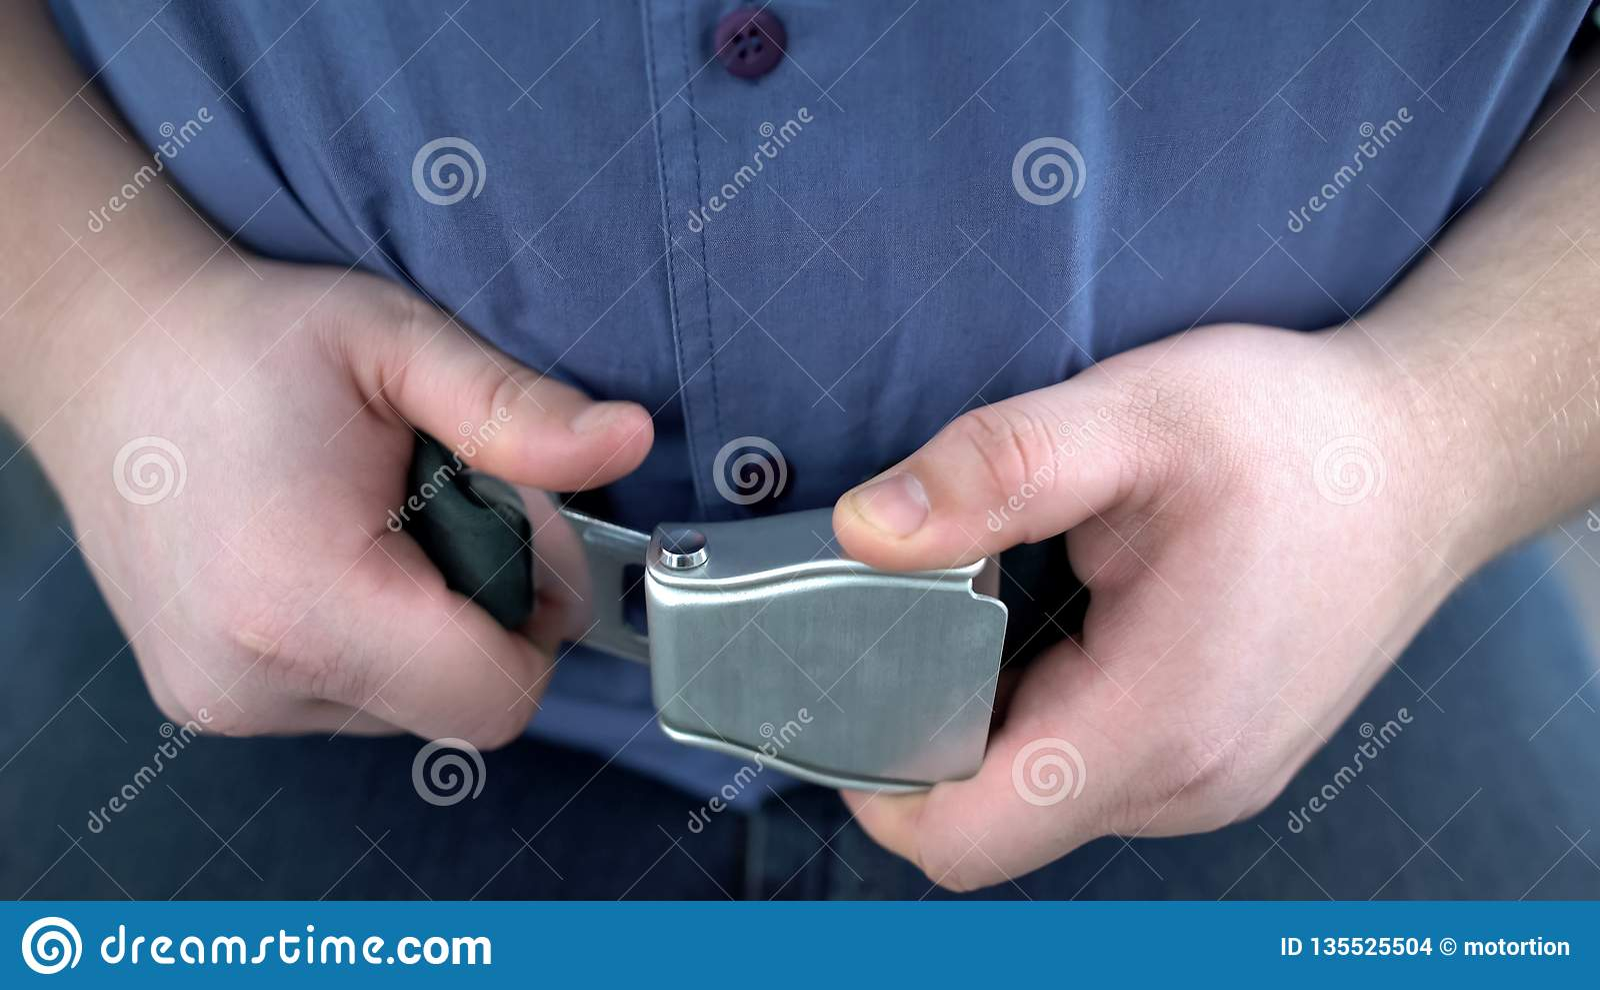 Obese male passenger fastening seat belt while sitting on airplane, safe flight